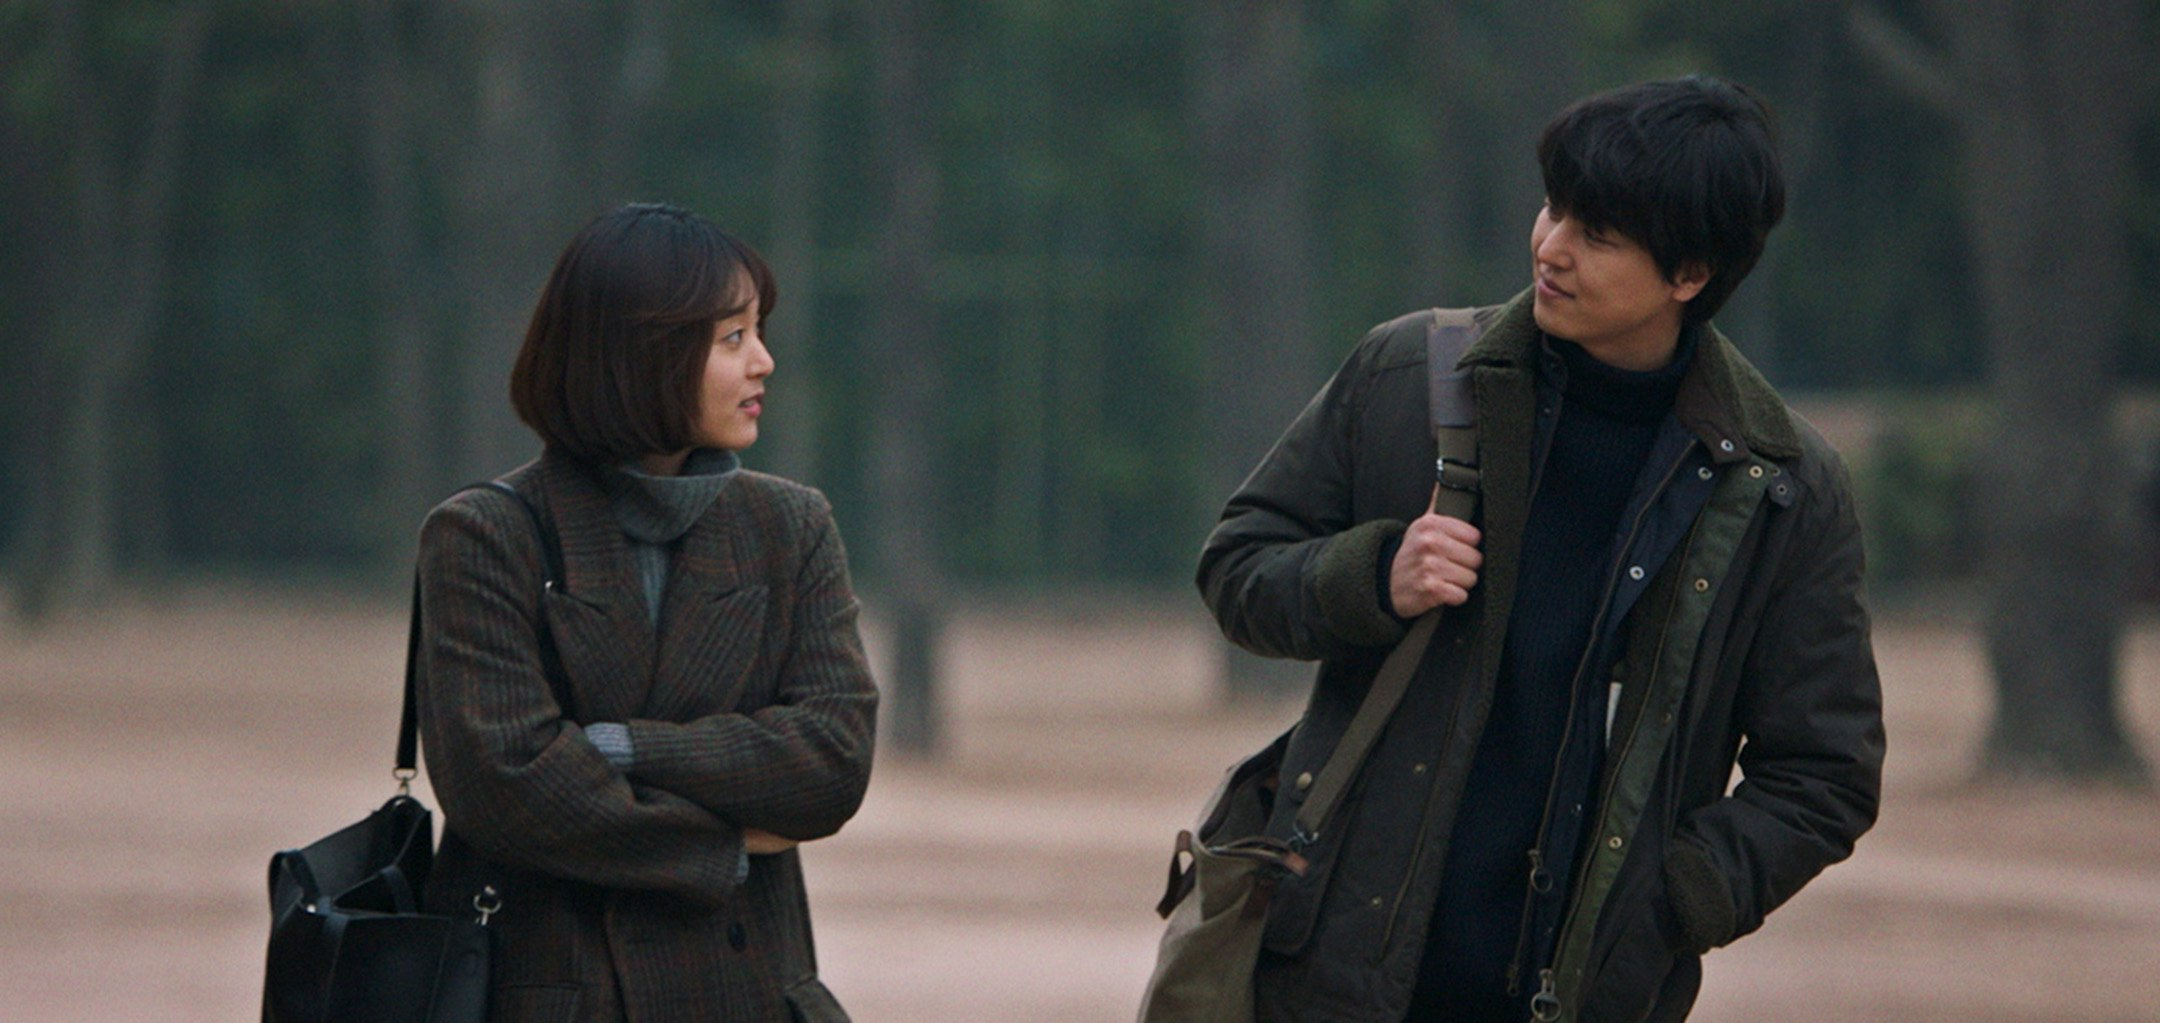 Hye-ri Yoon and Woo-jin Yeon in 'Shades of the Heart' (2021)